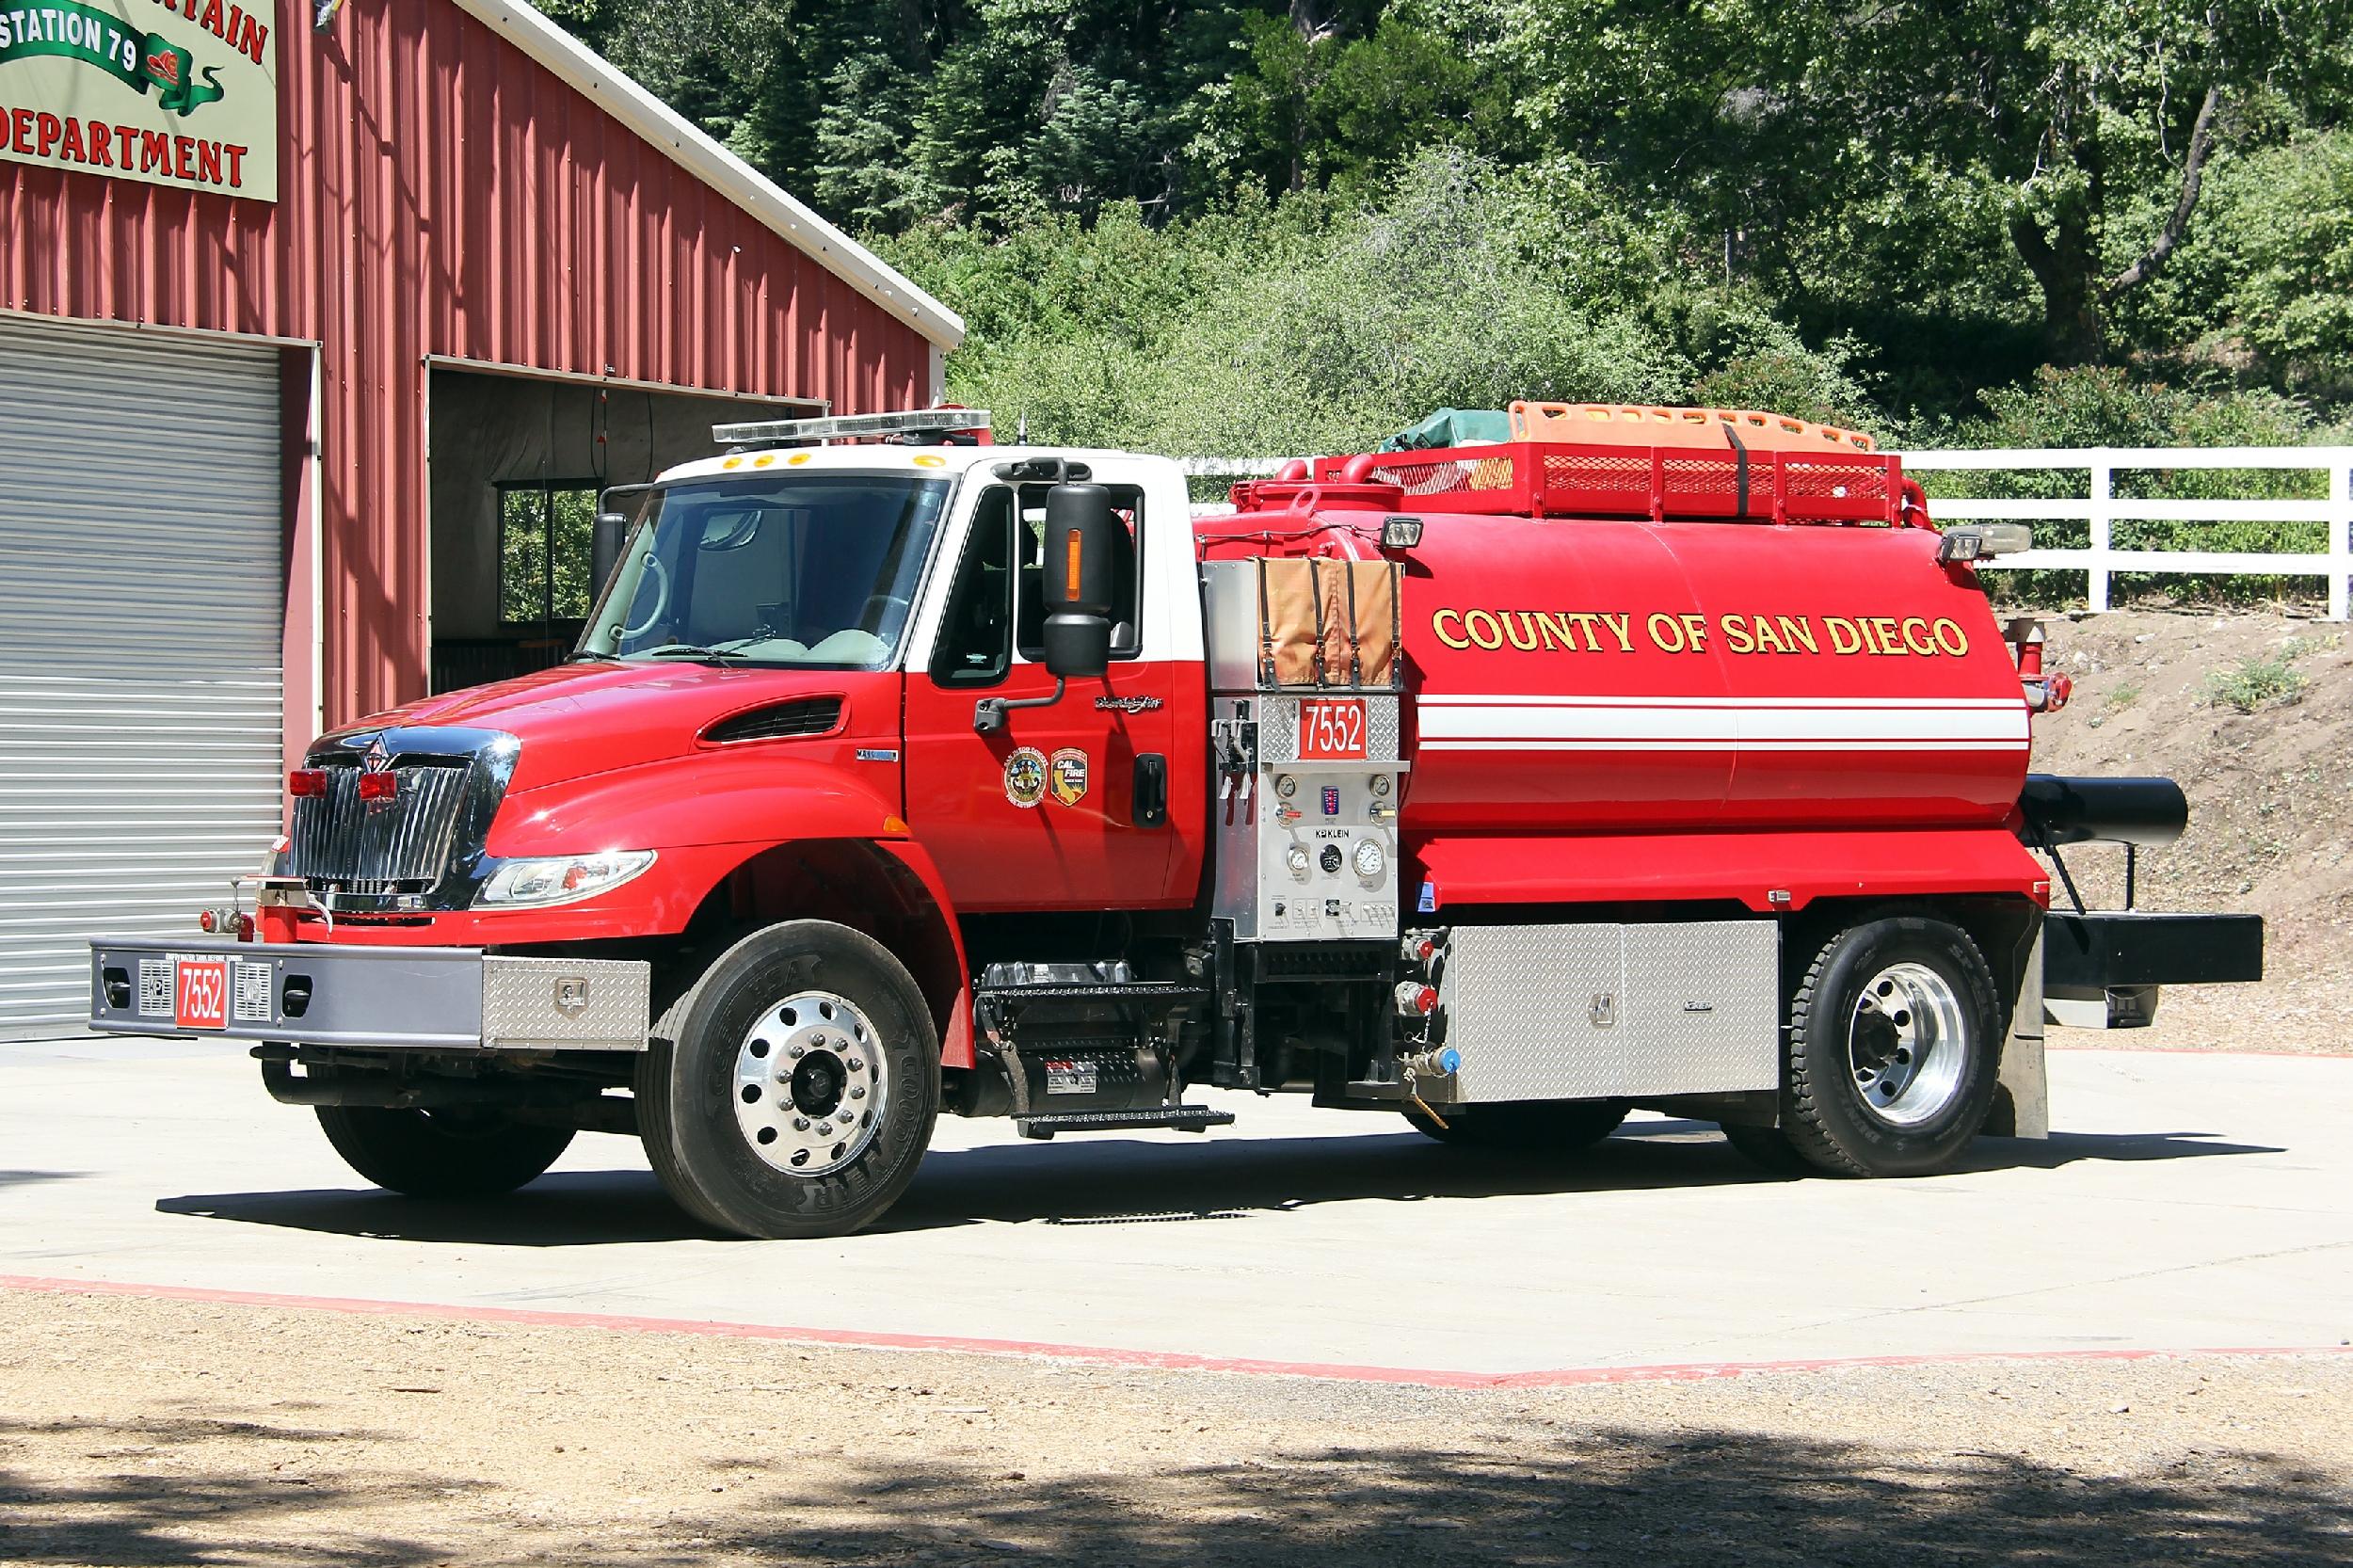 CA, Palomar Mountain Volunteer Fire Department